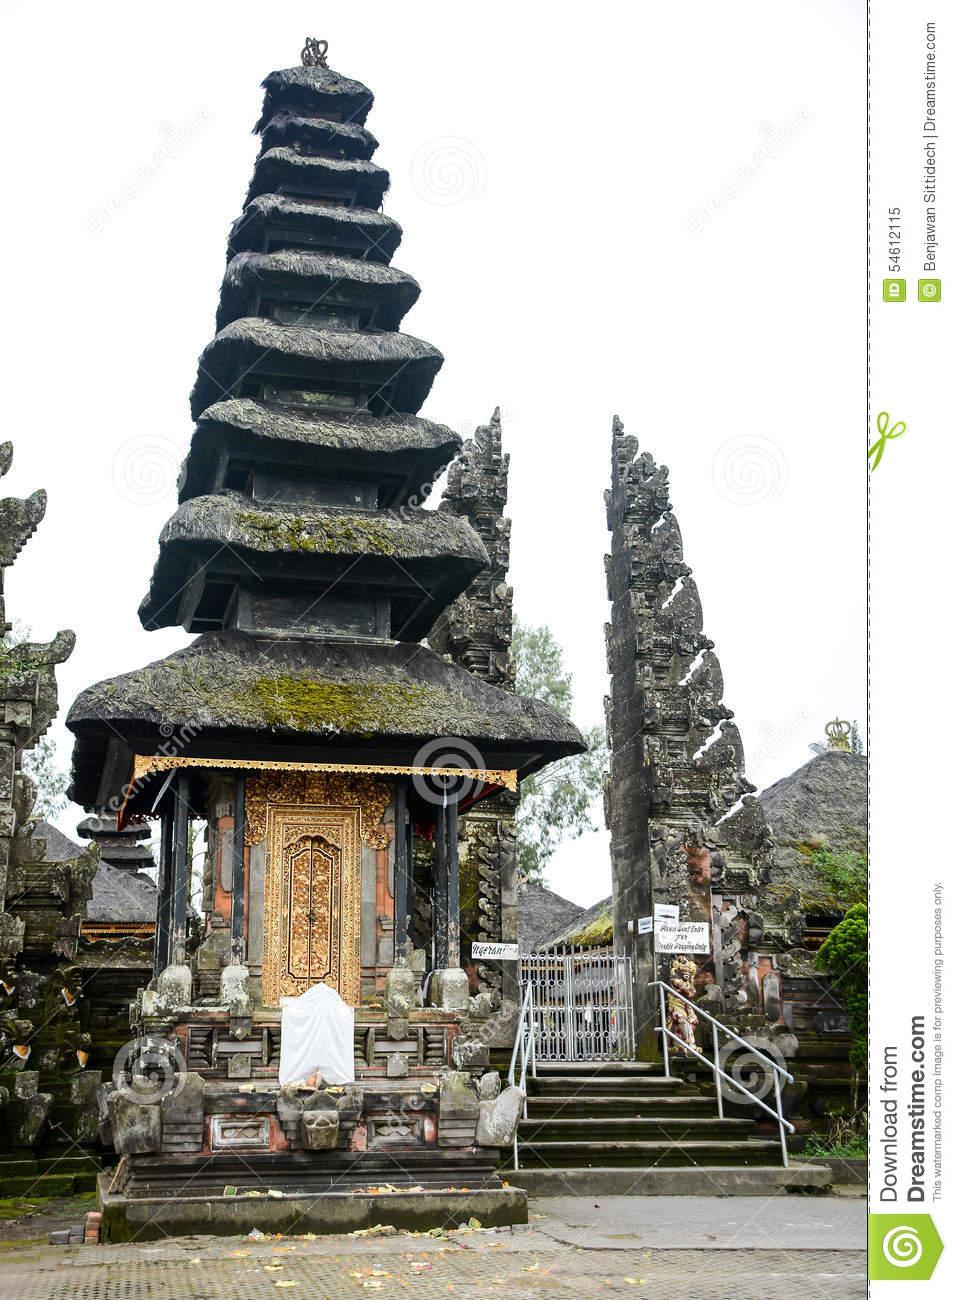 Batur Temple, Bali, Indonesia Stock Photo.